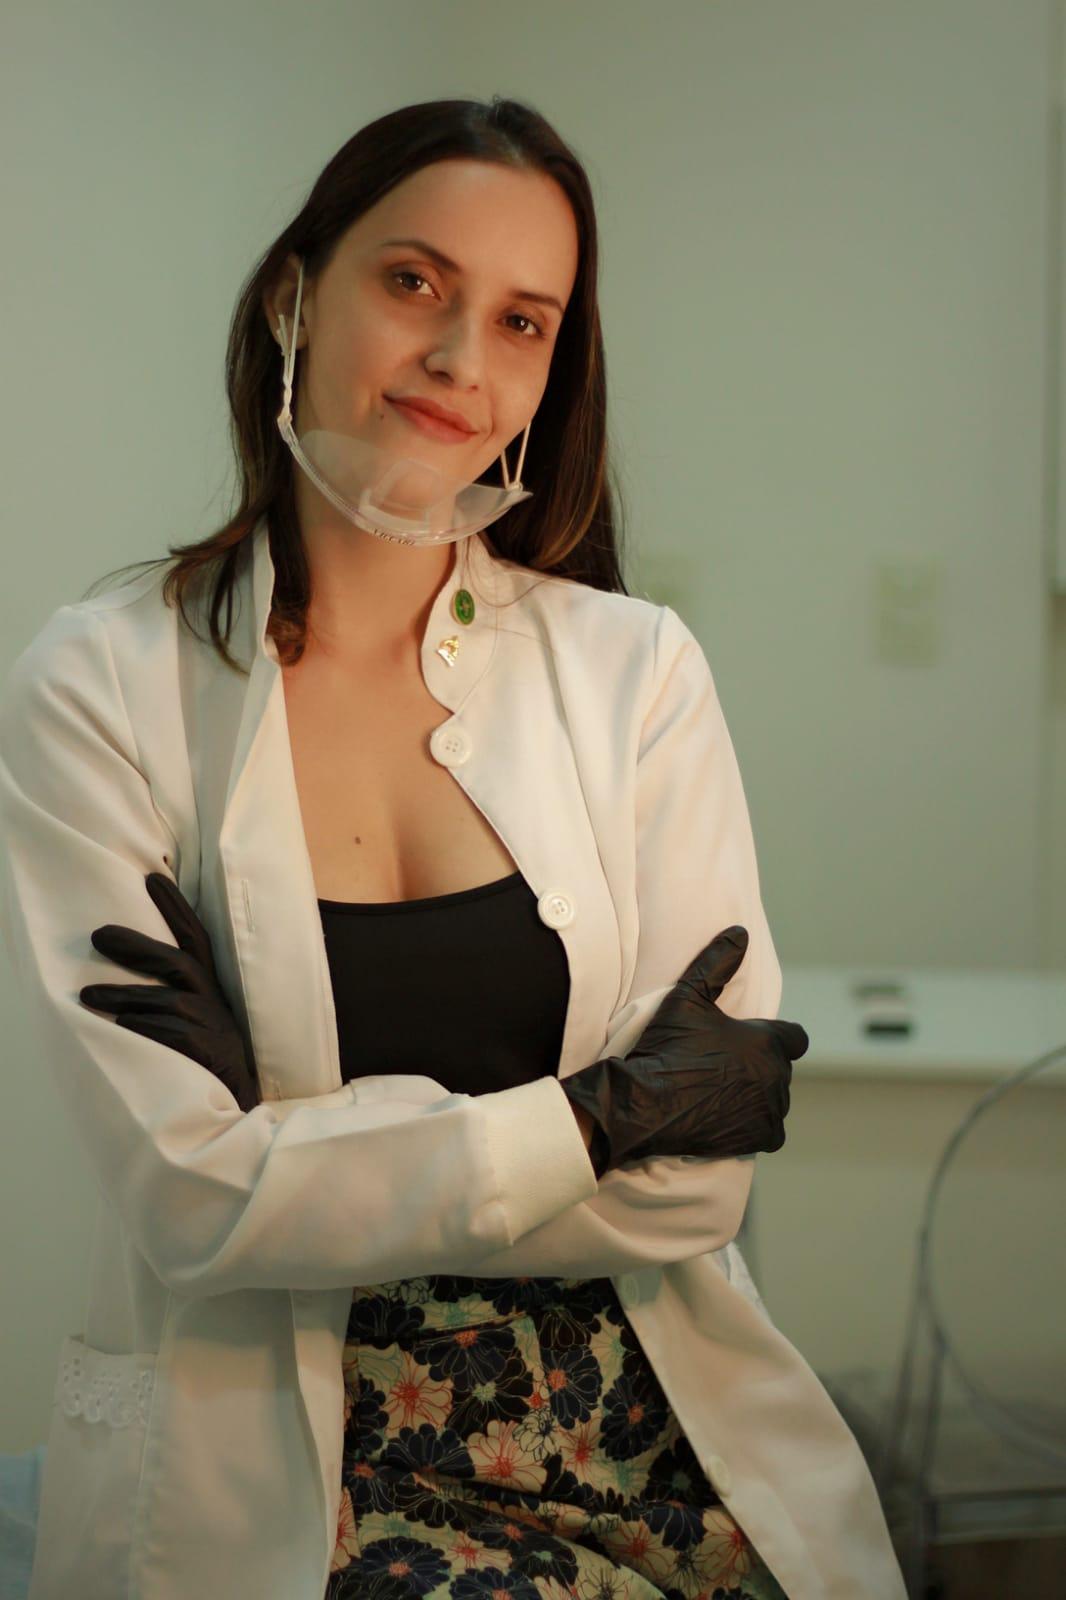 Nicoli Mortari